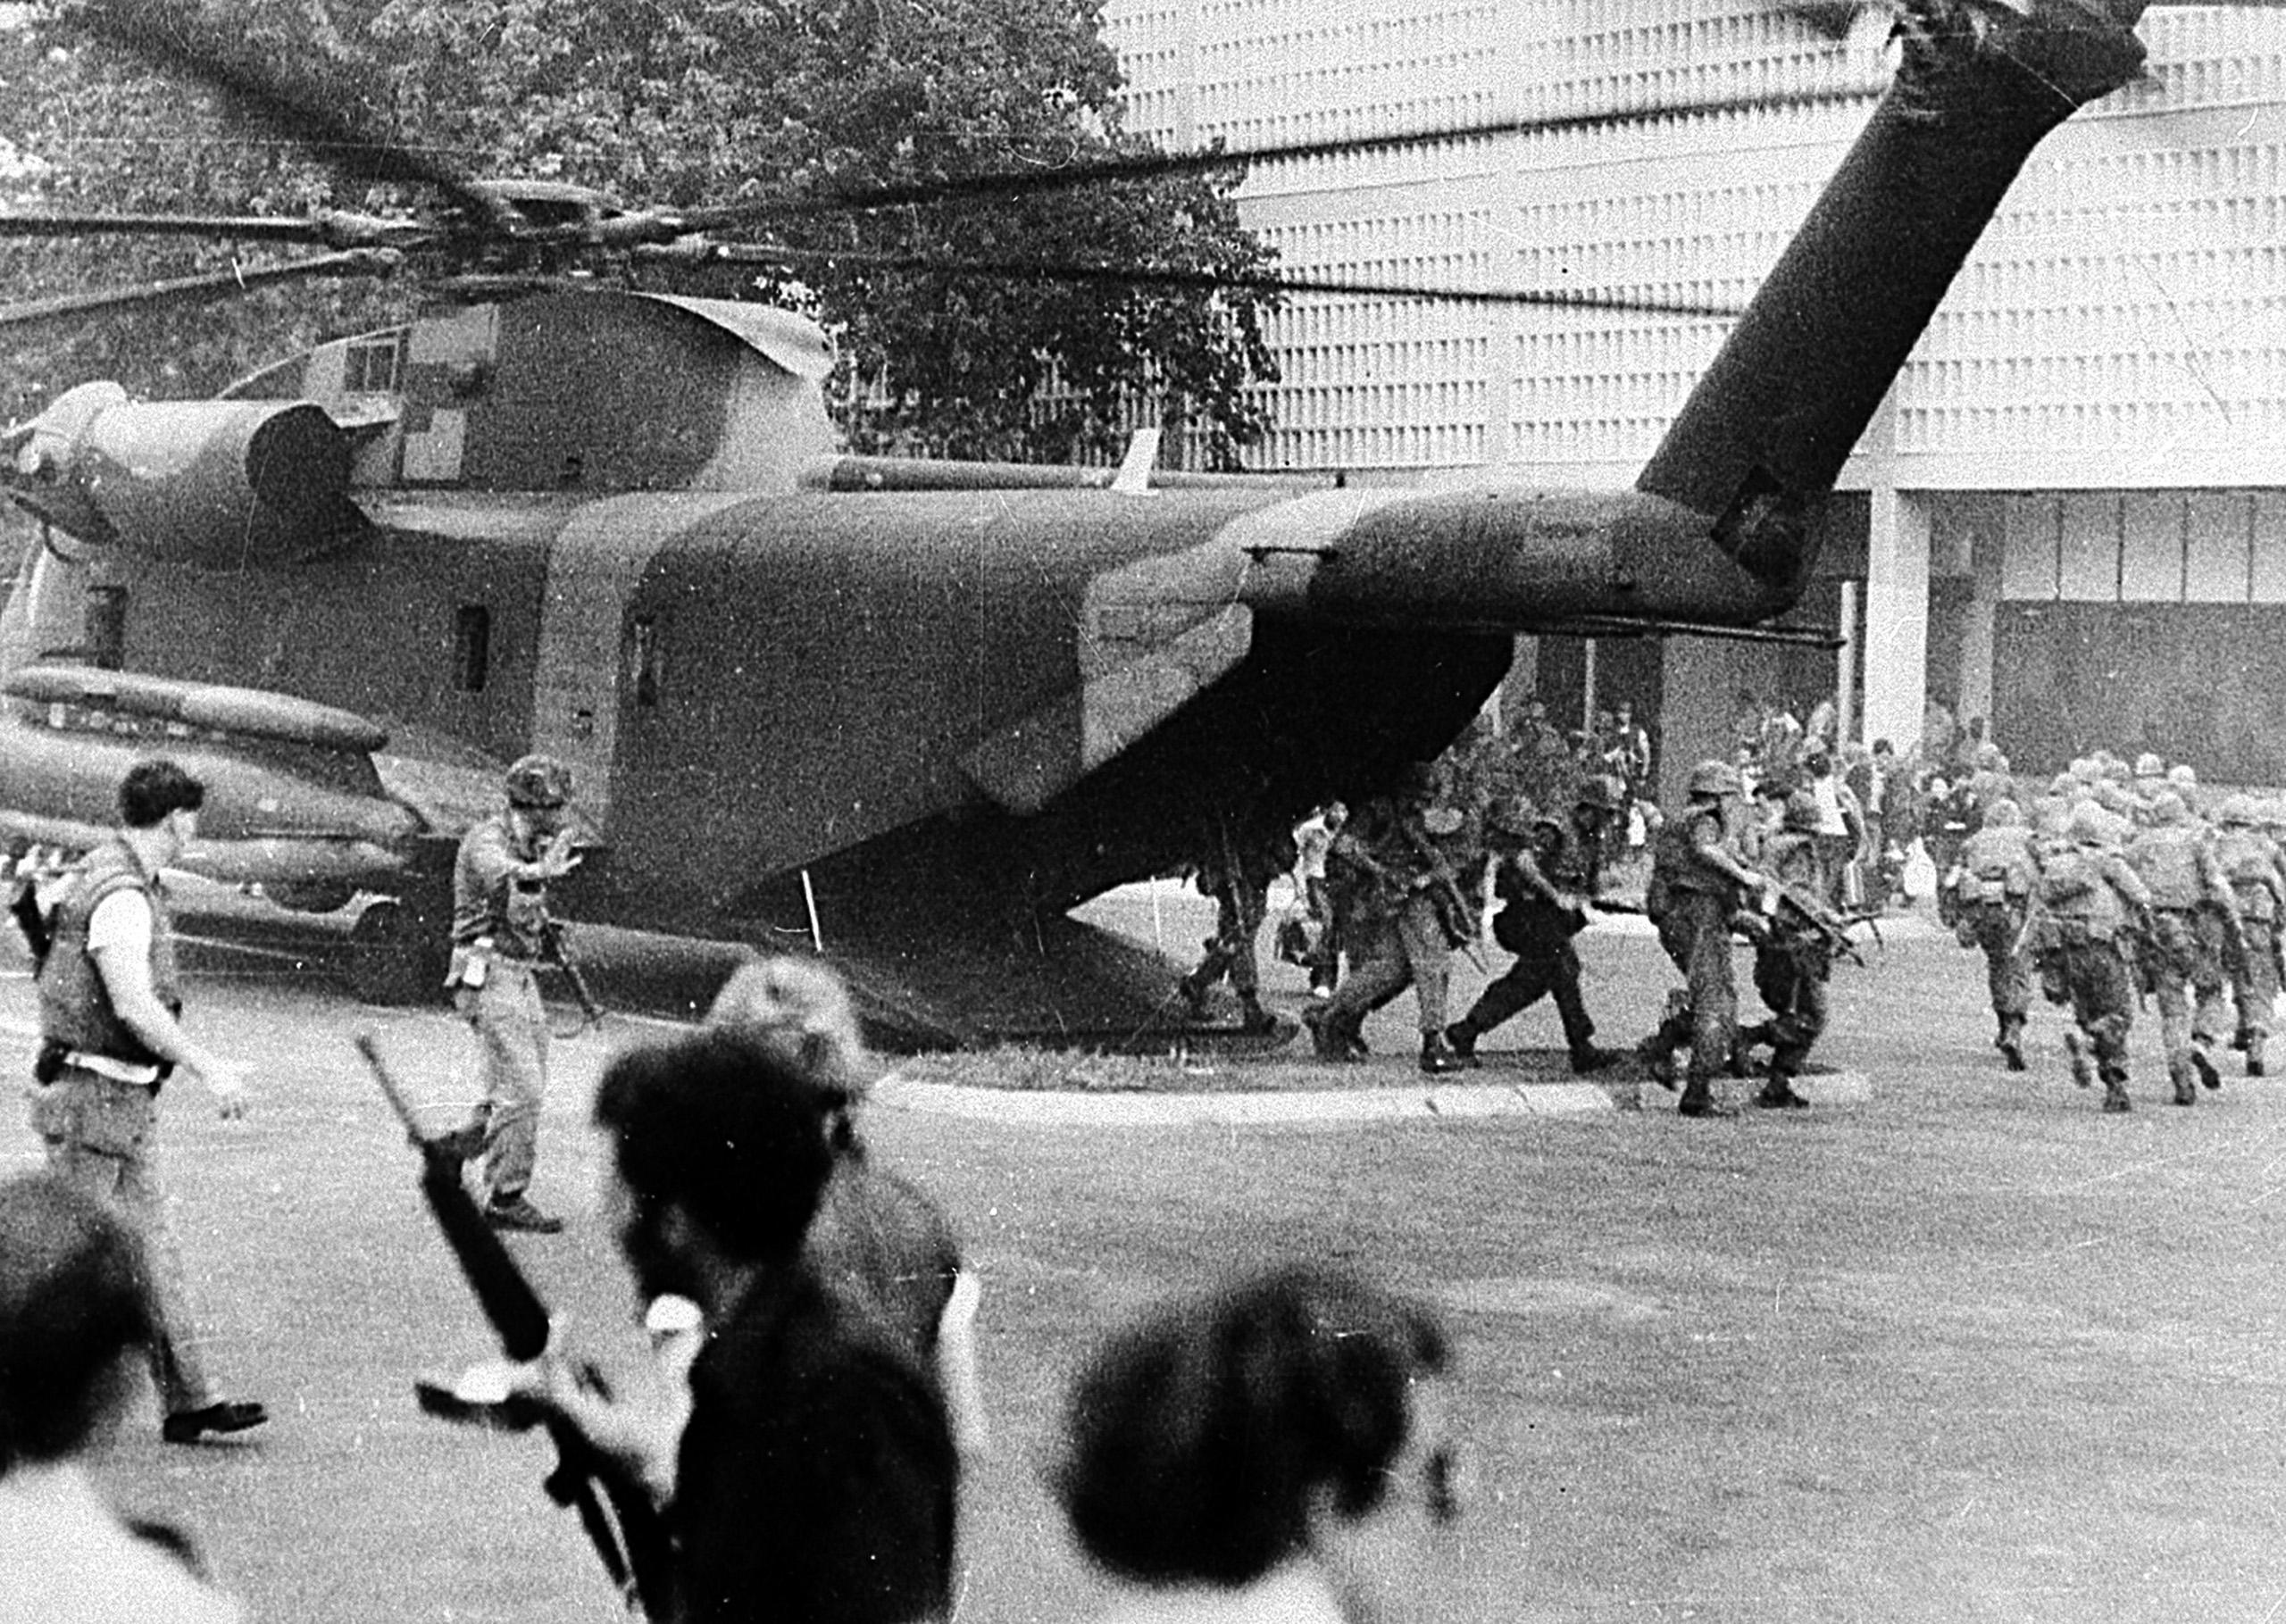 U.S. Marines' helicopter evacuation.